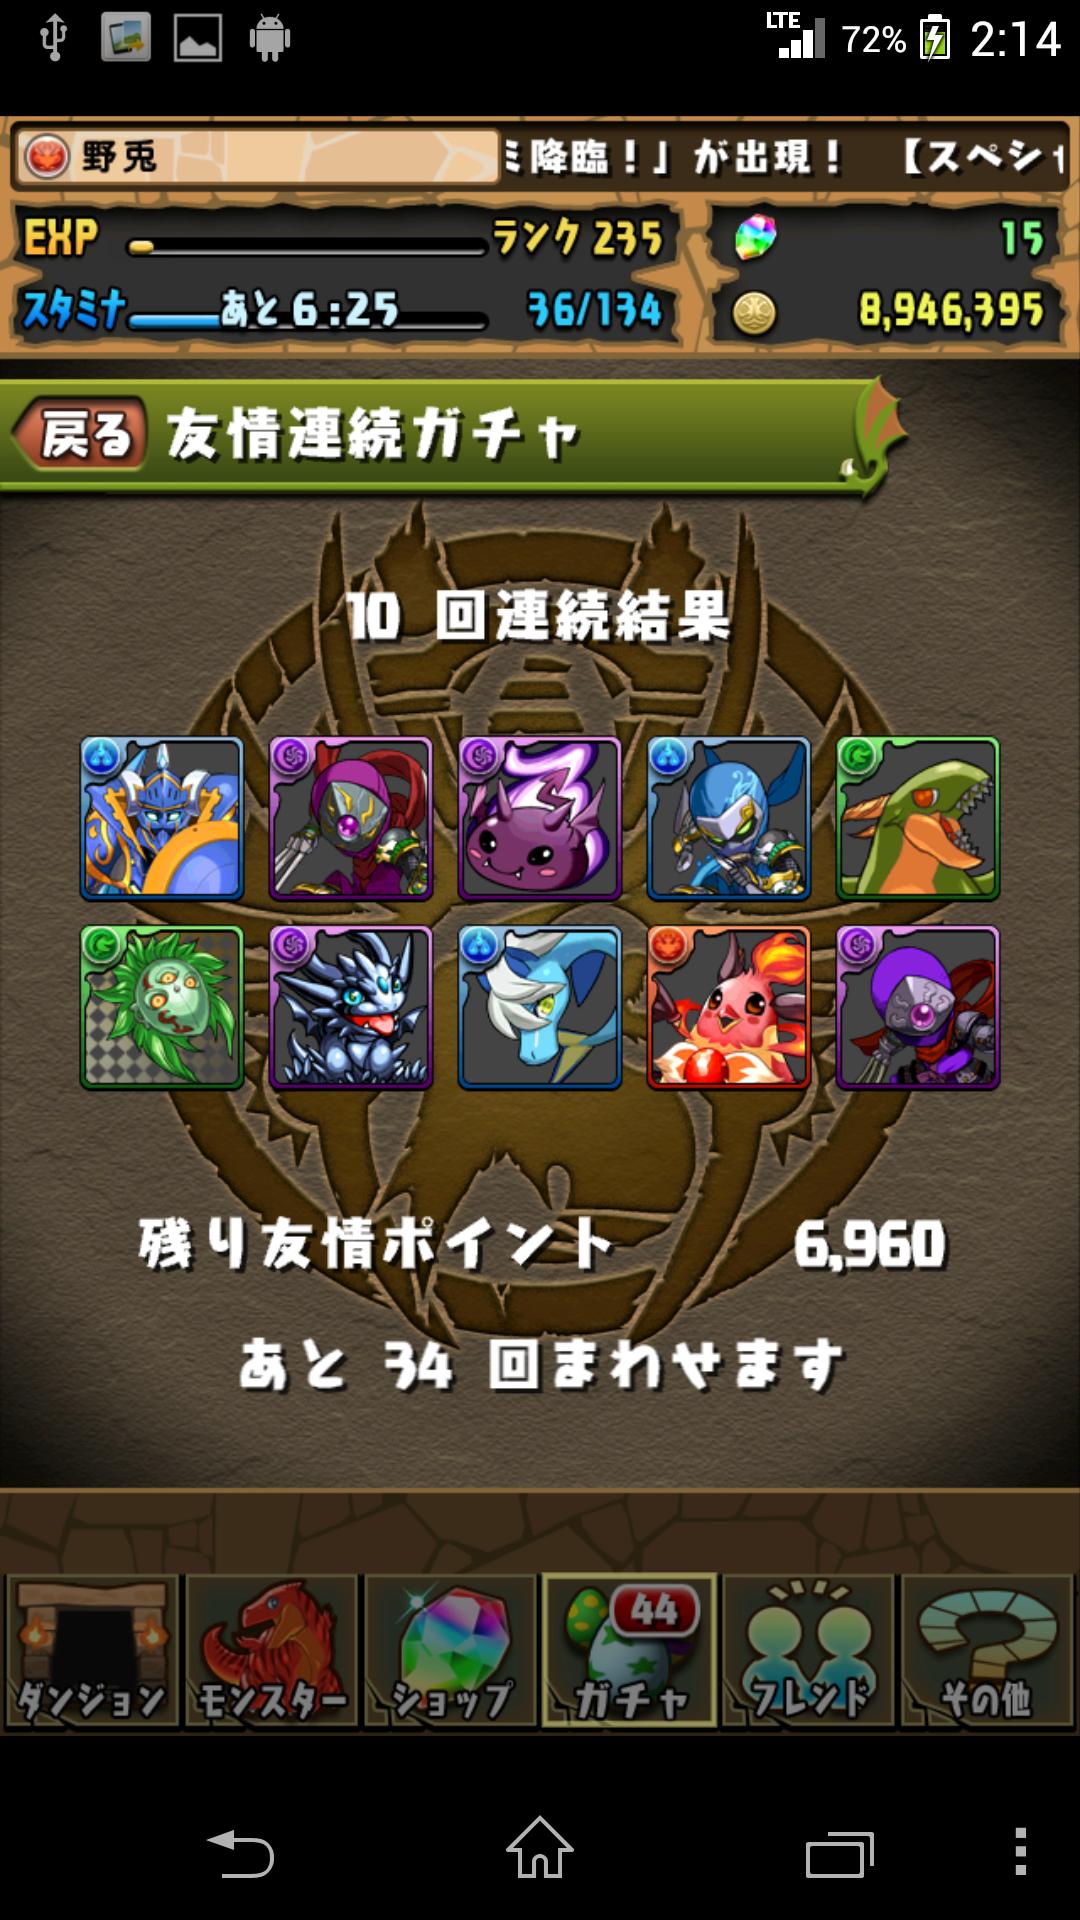 Screenshot_2014-04-29-02-14-31.png